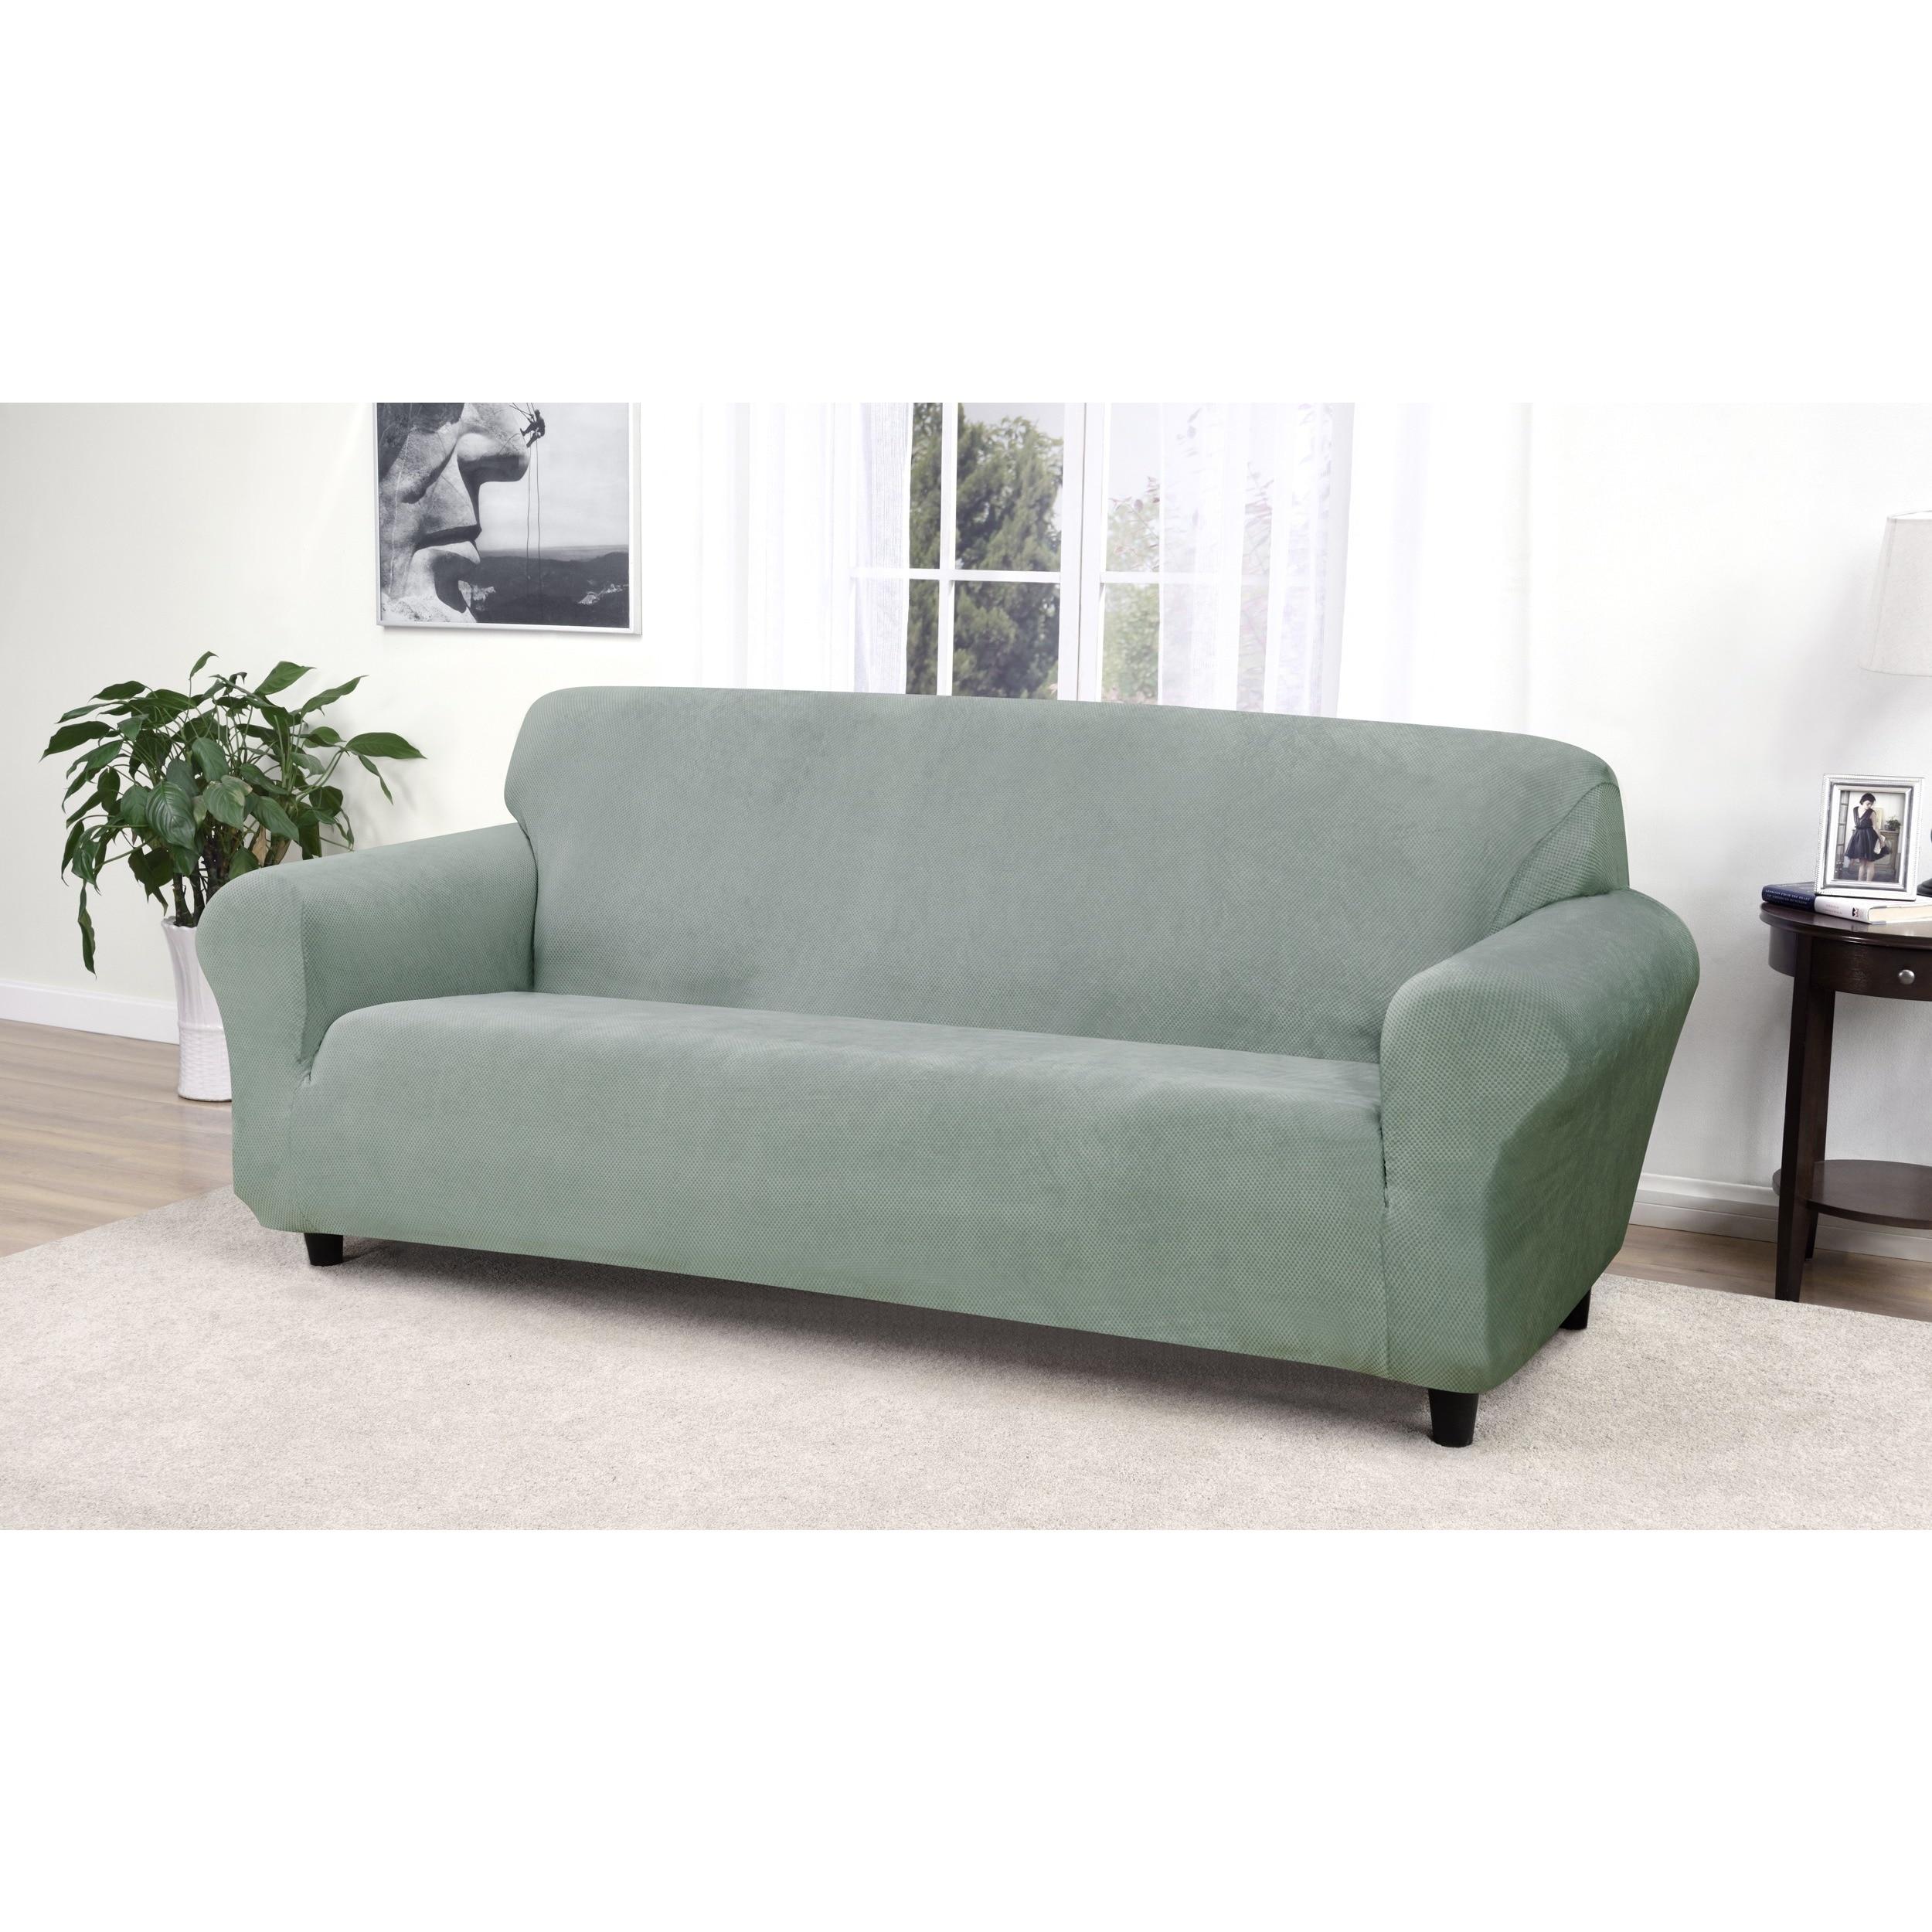 Kathy Ireland Day Break Sofa Slipcover Free Shipping Today  ~ Turquoise Slipcover Sofa